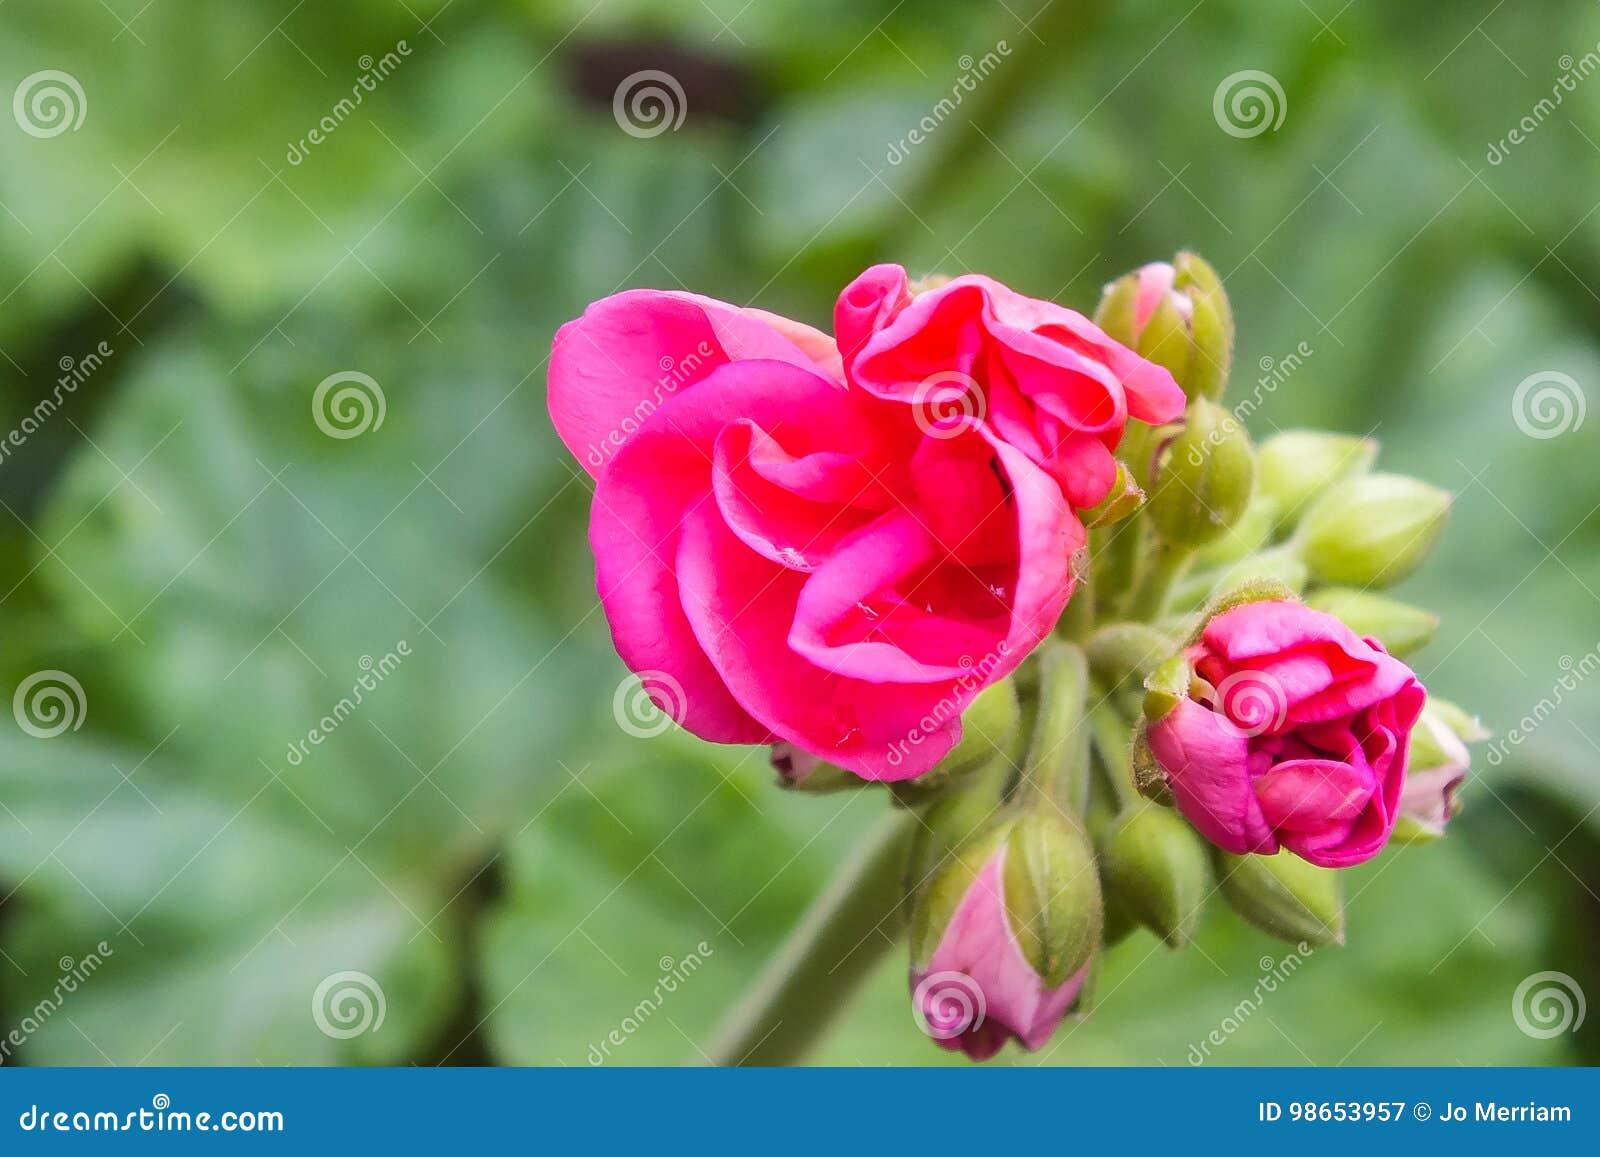 Bright Pink Geranium Flower Buds Opening